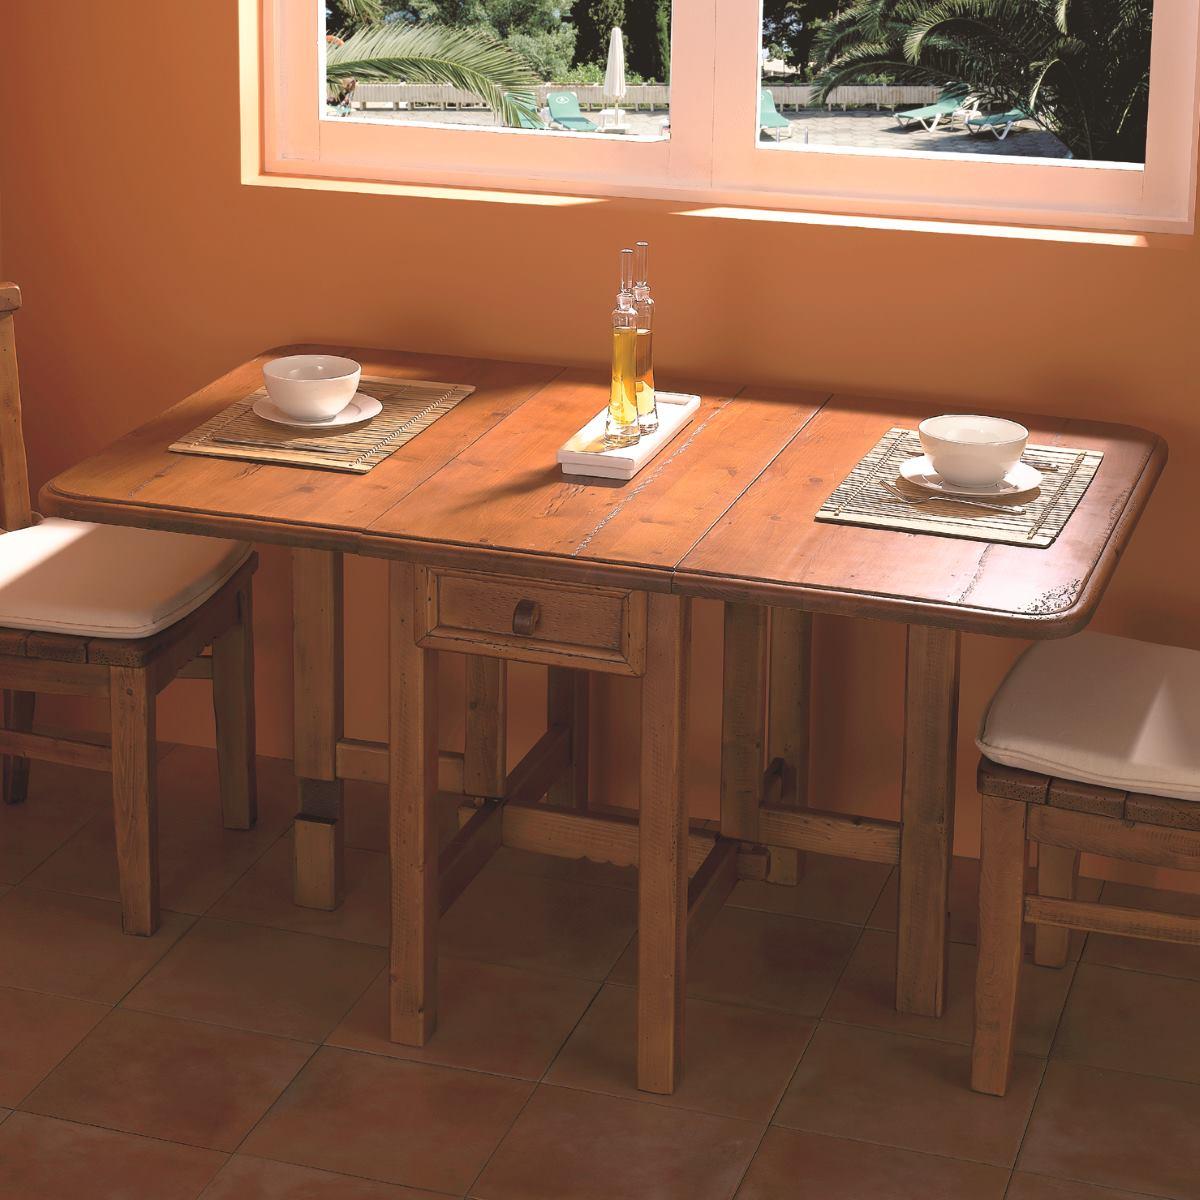 Mesa de madera r stica abatible con caj n 142cm for Mesa de salon abatible